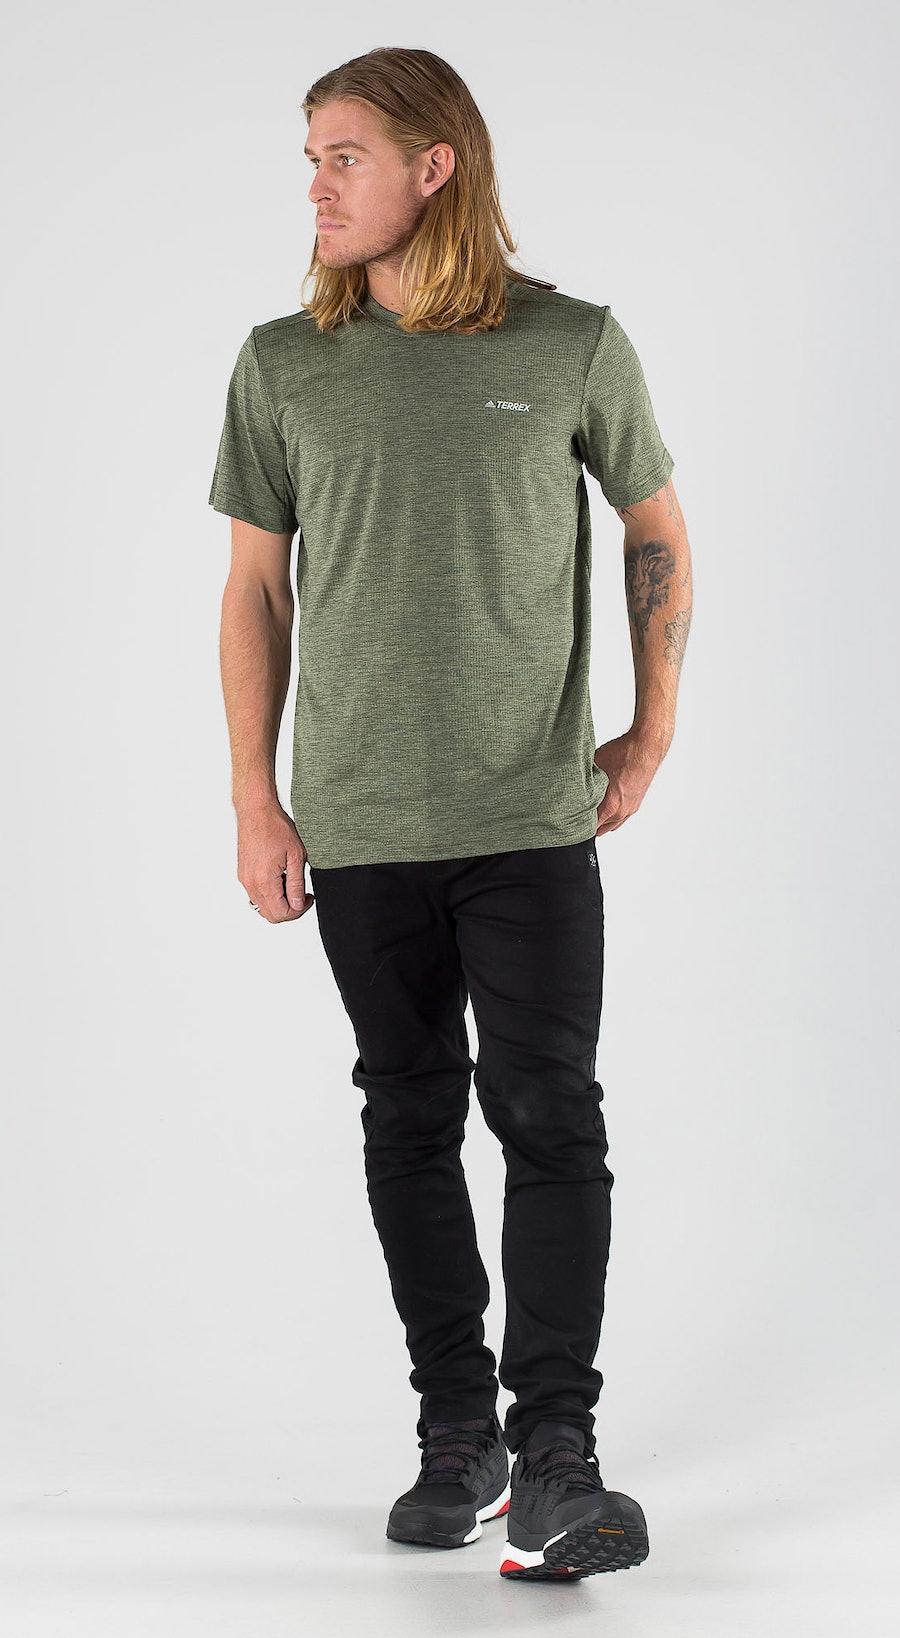 Adidas Terrex Tivid Legend Earth Outfit Multi